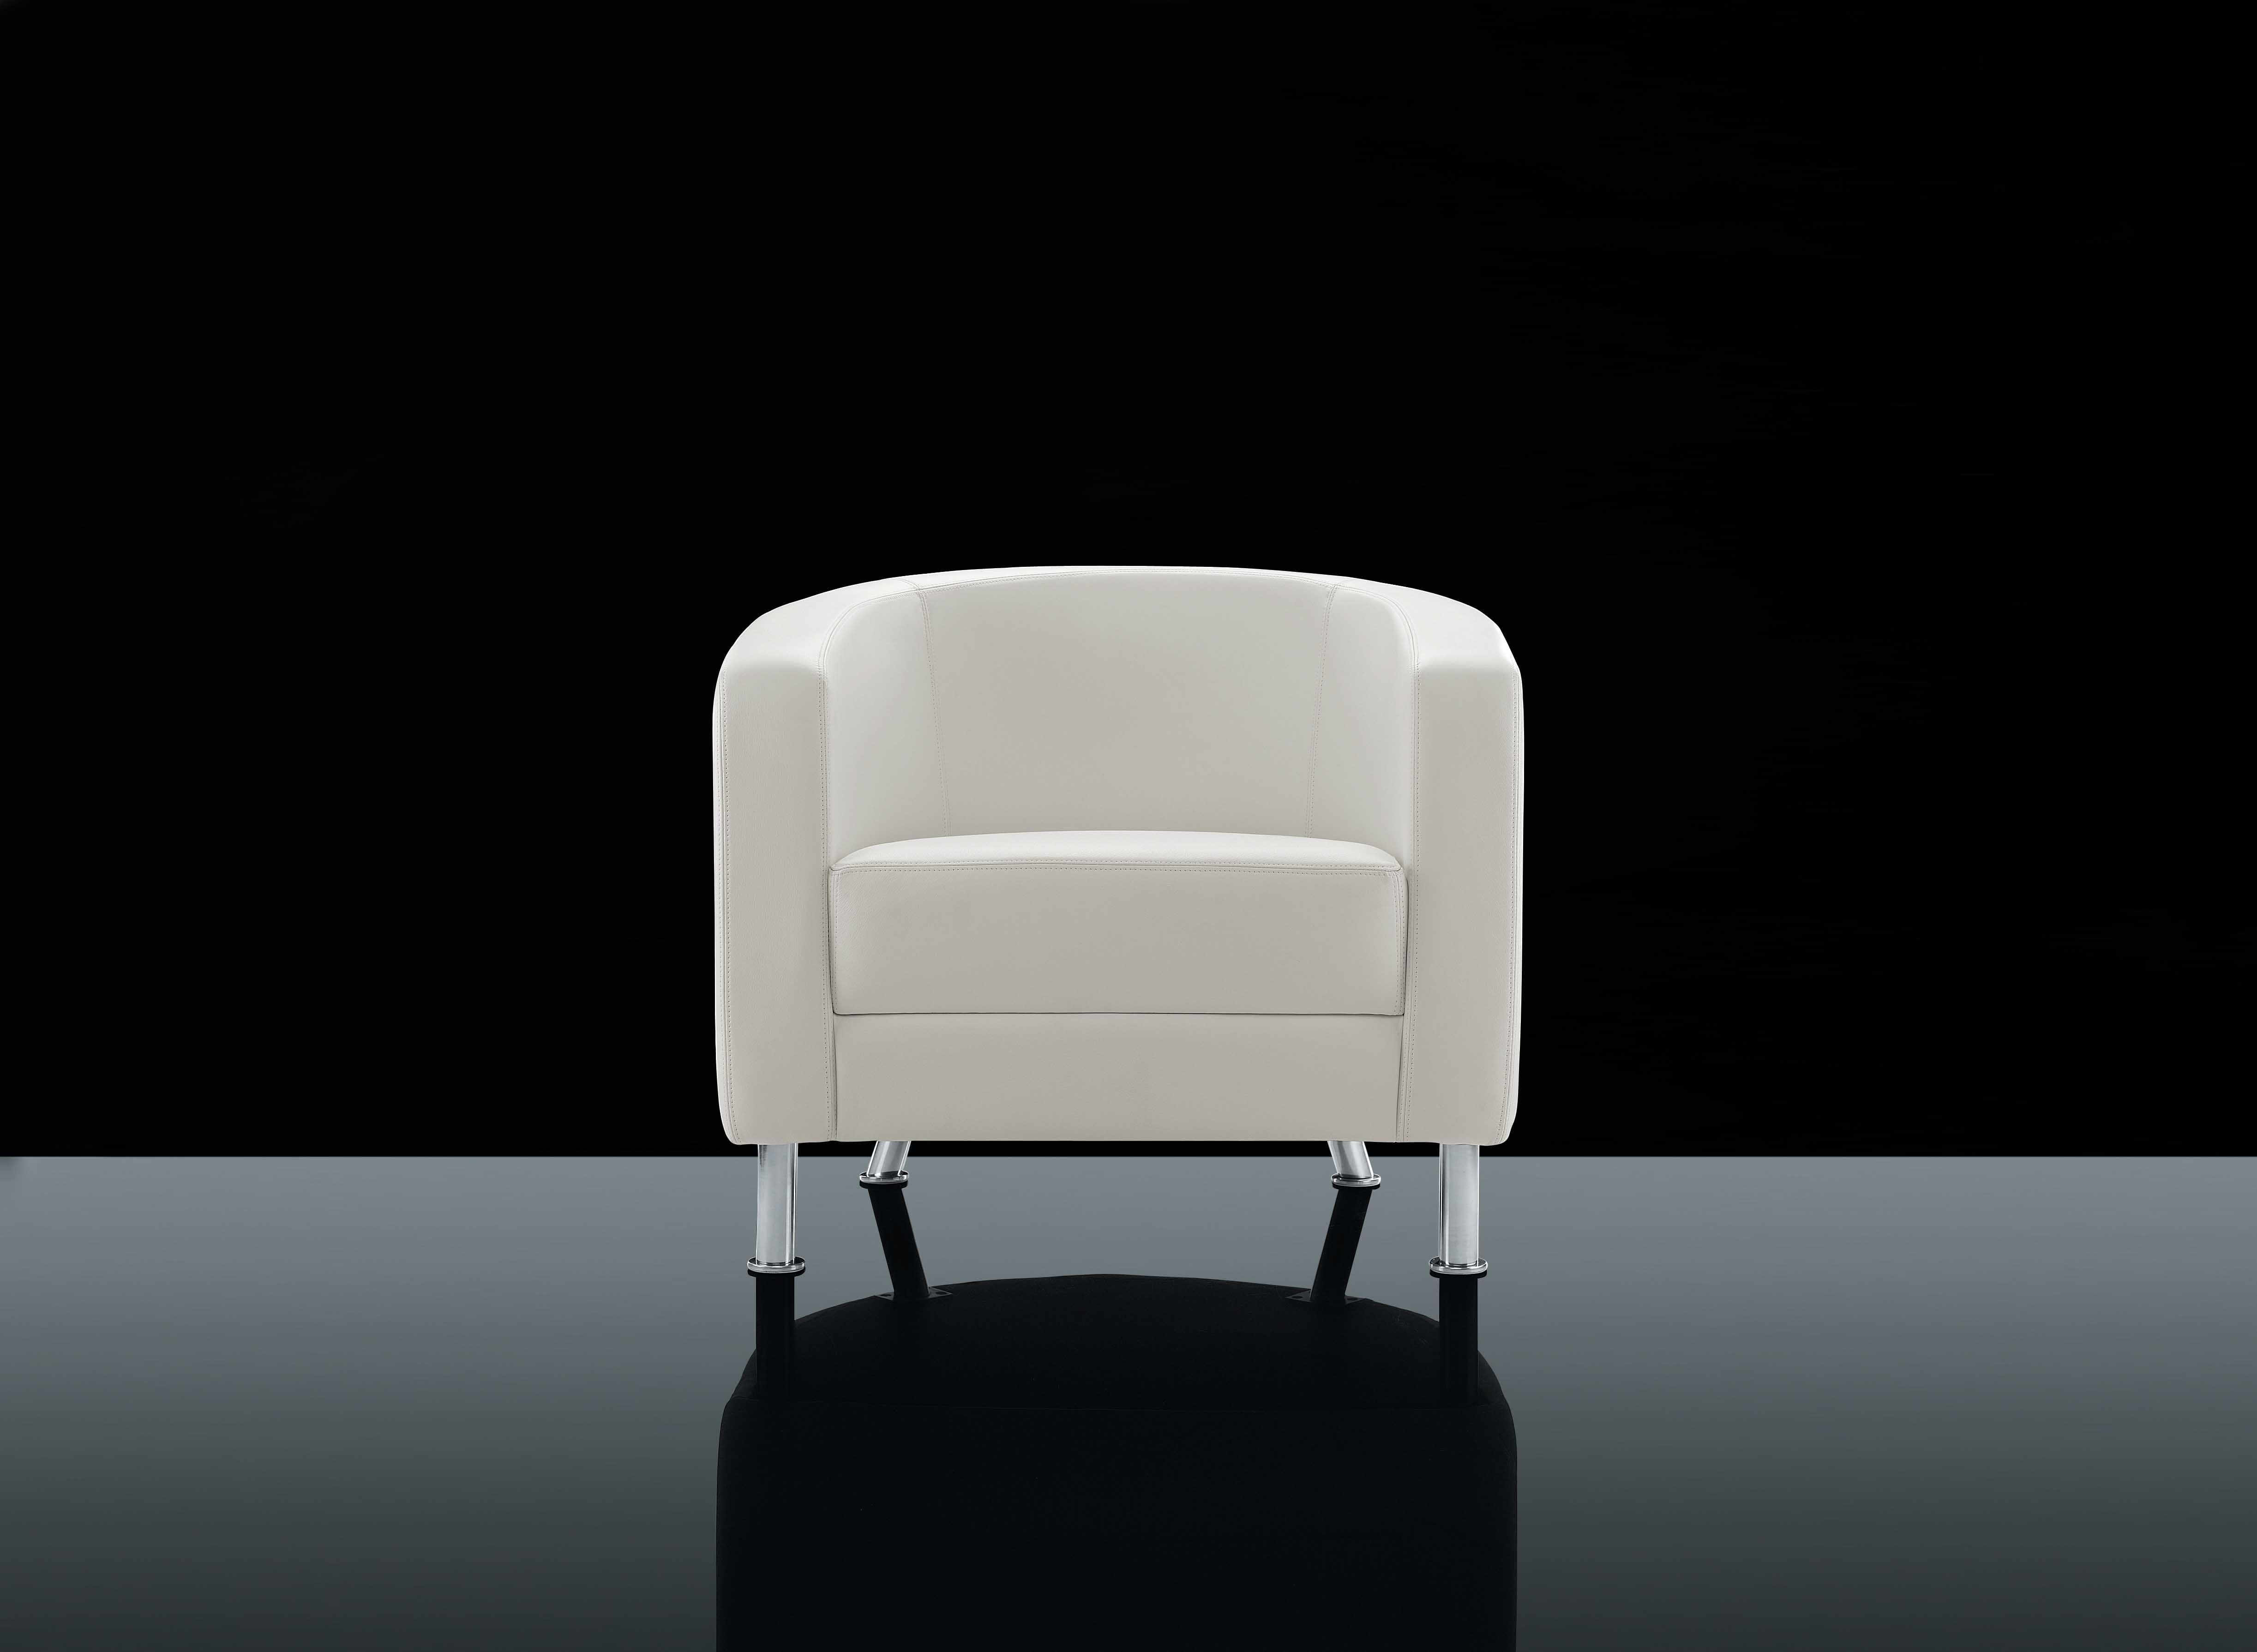 White Chair Black Background Black Magic Pinterest